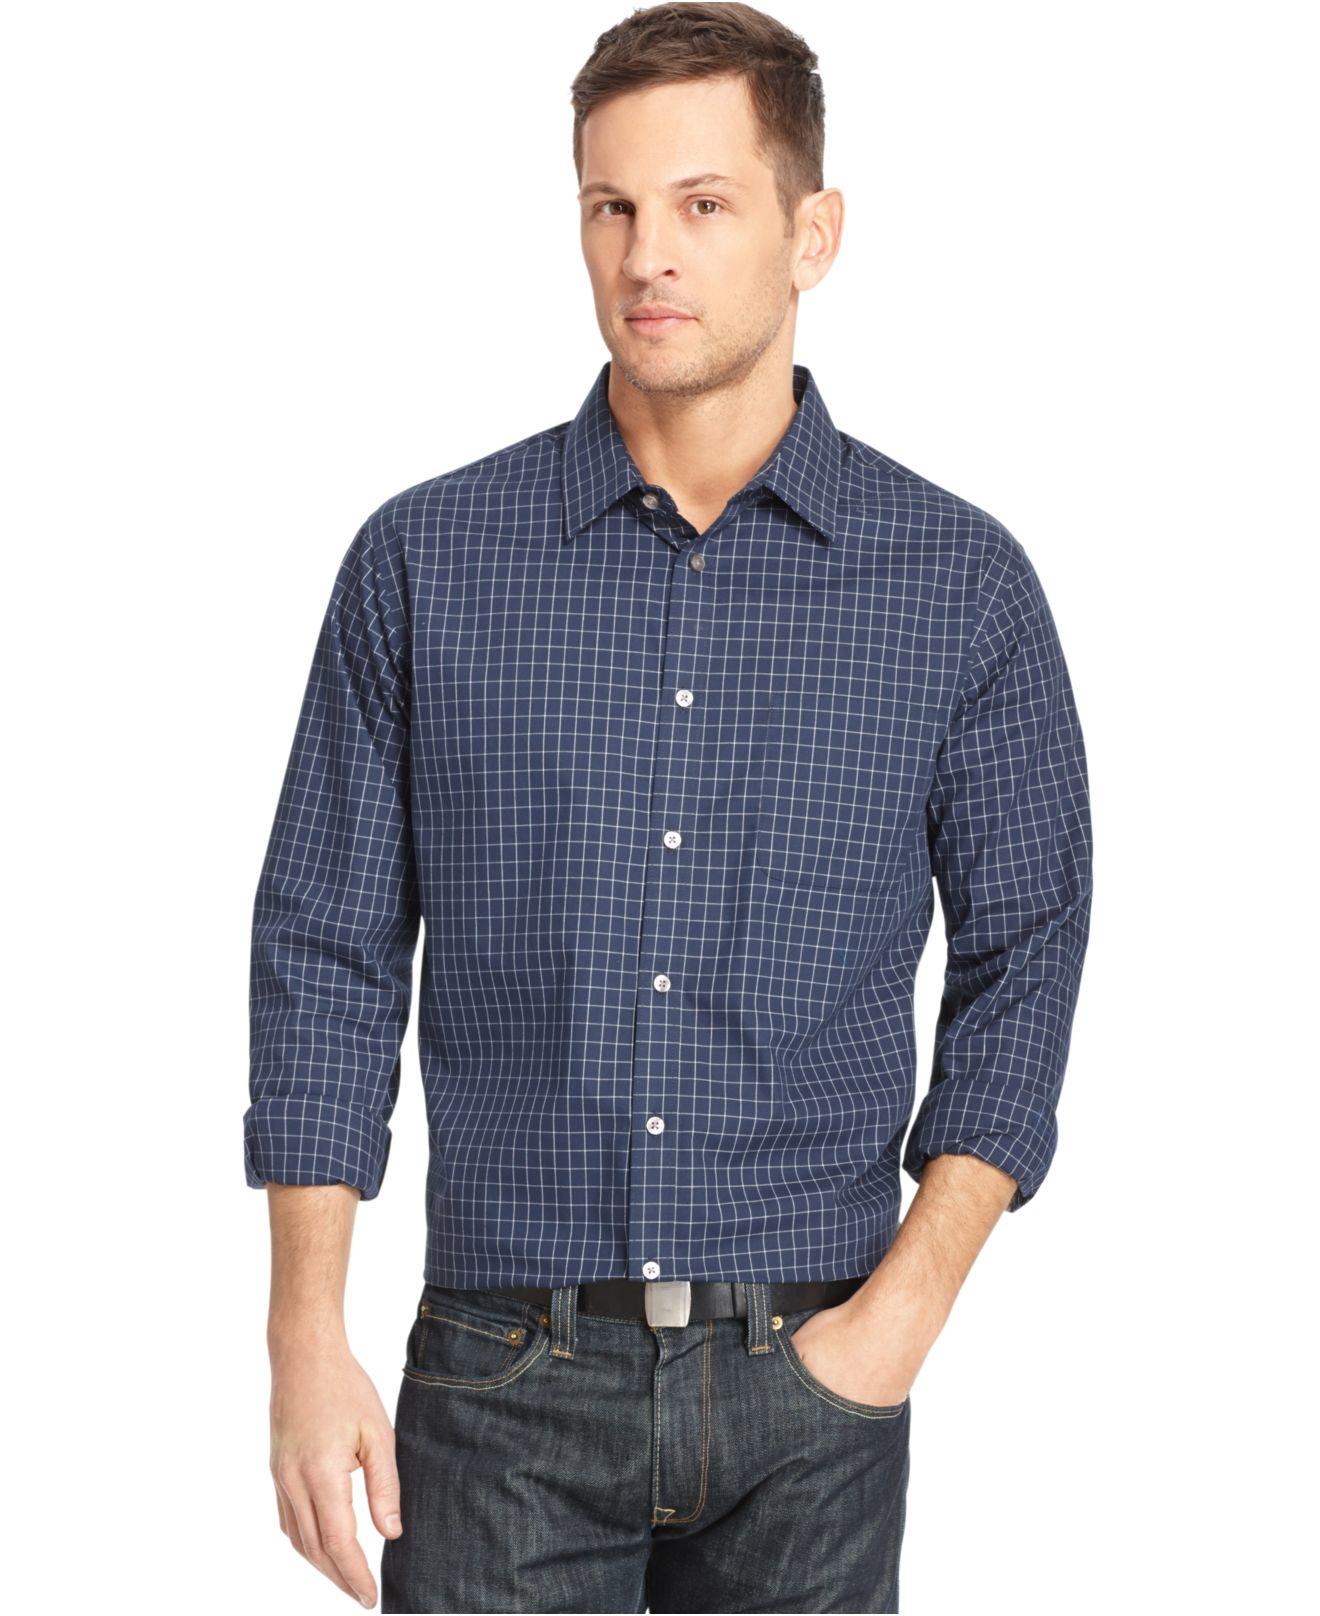 Van heusen long sleeve no iron shirt in natural for men lyst for No iron shirts mens